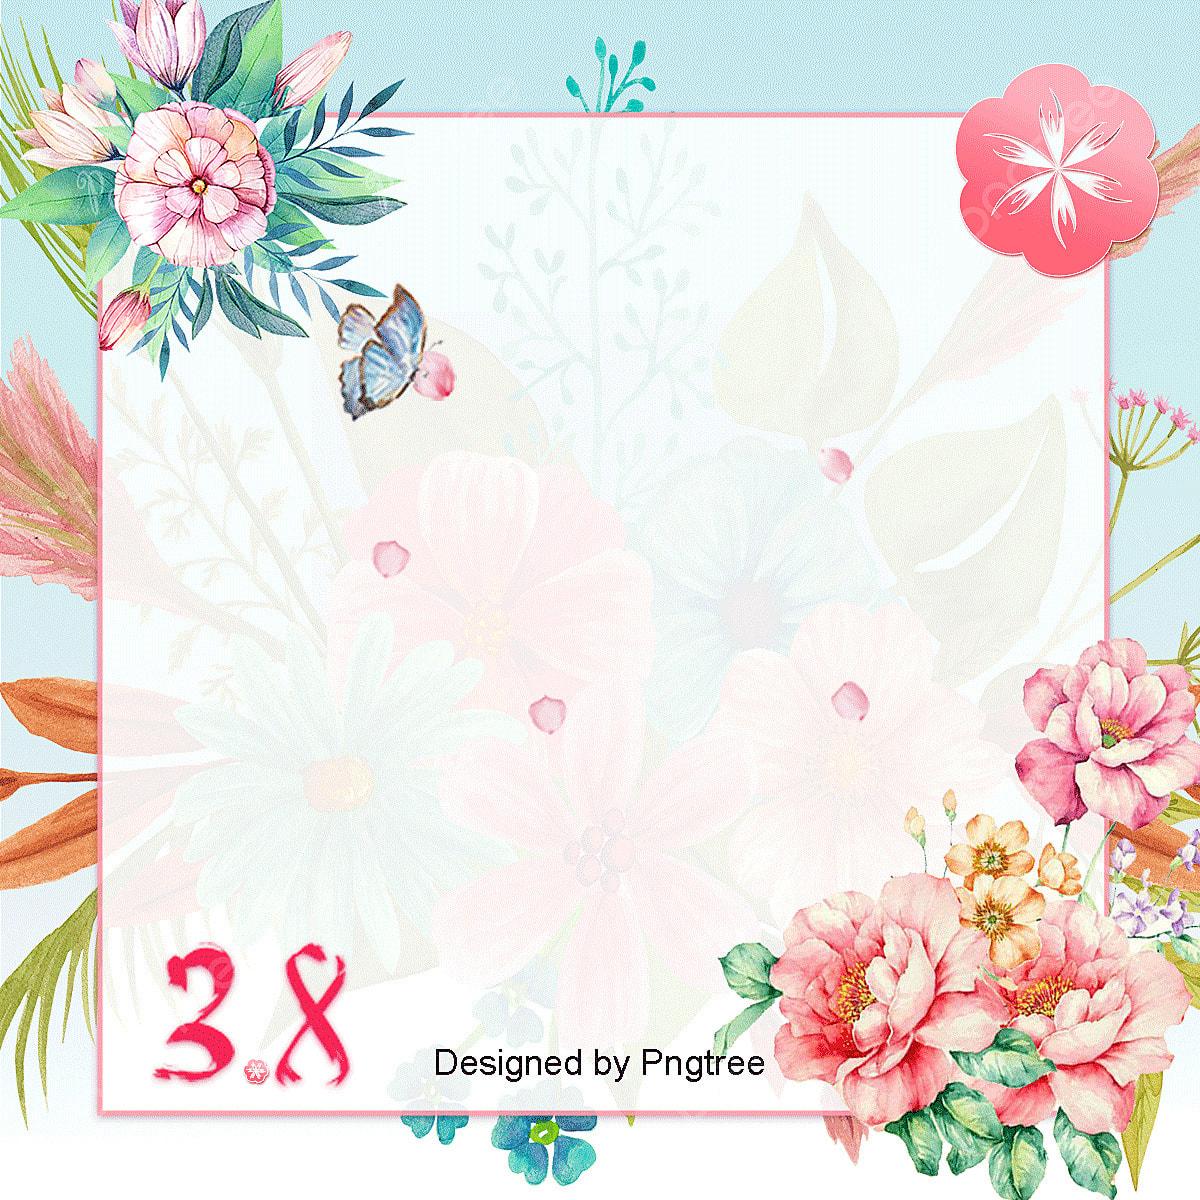 Aesthetic Handpainted Flowers 38 Background Elements Of Goddess